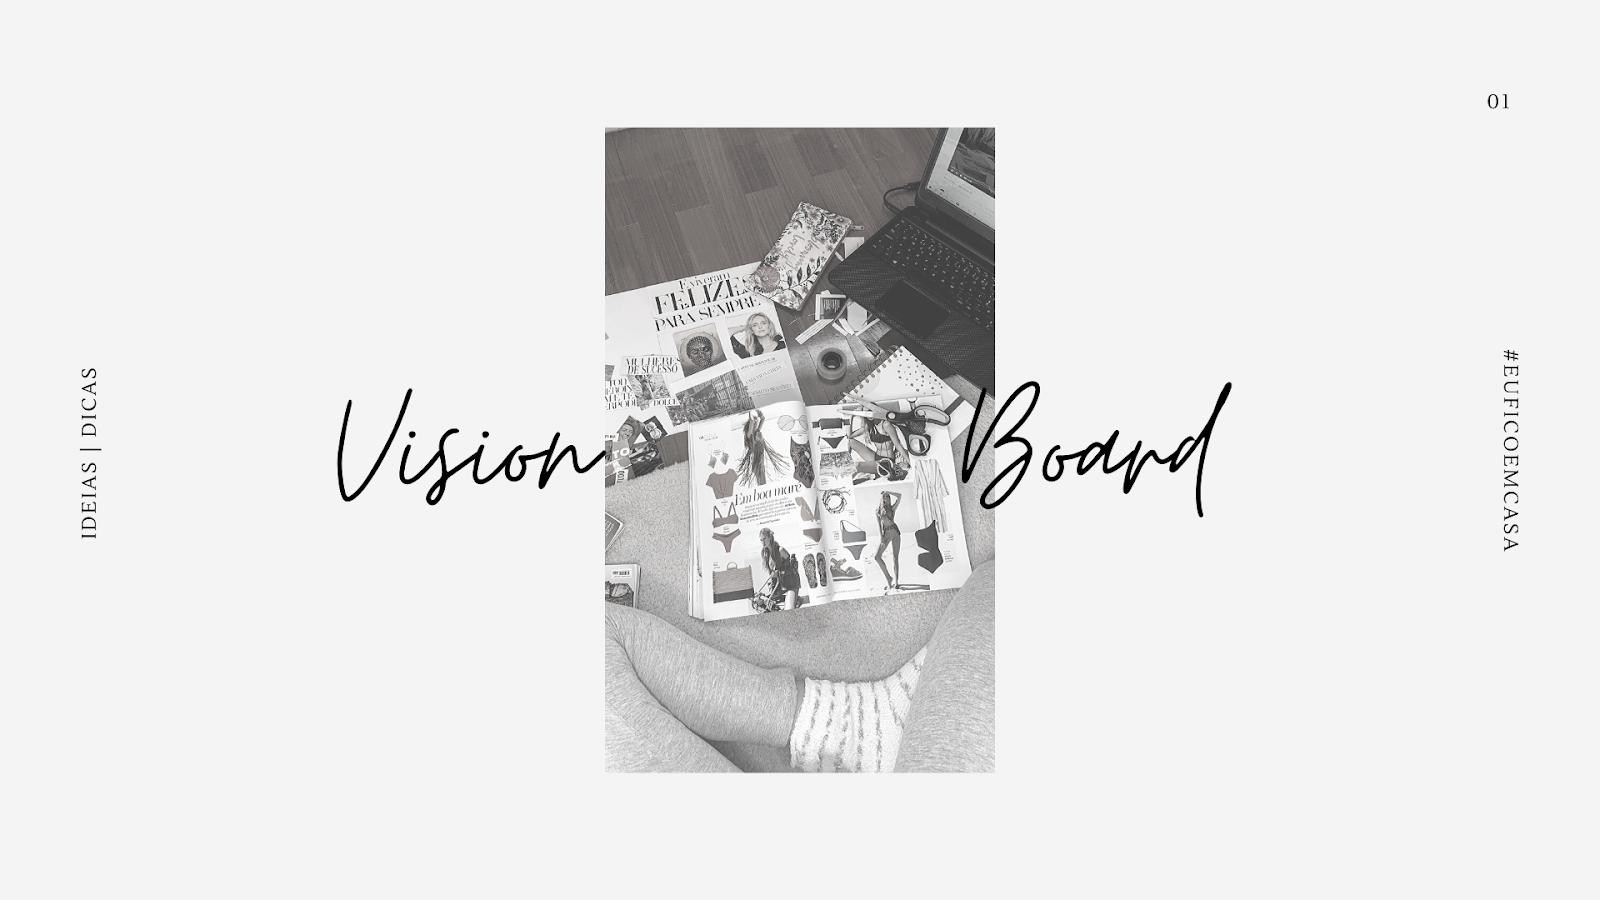 VISION BOARD #EUFICOEMCASA